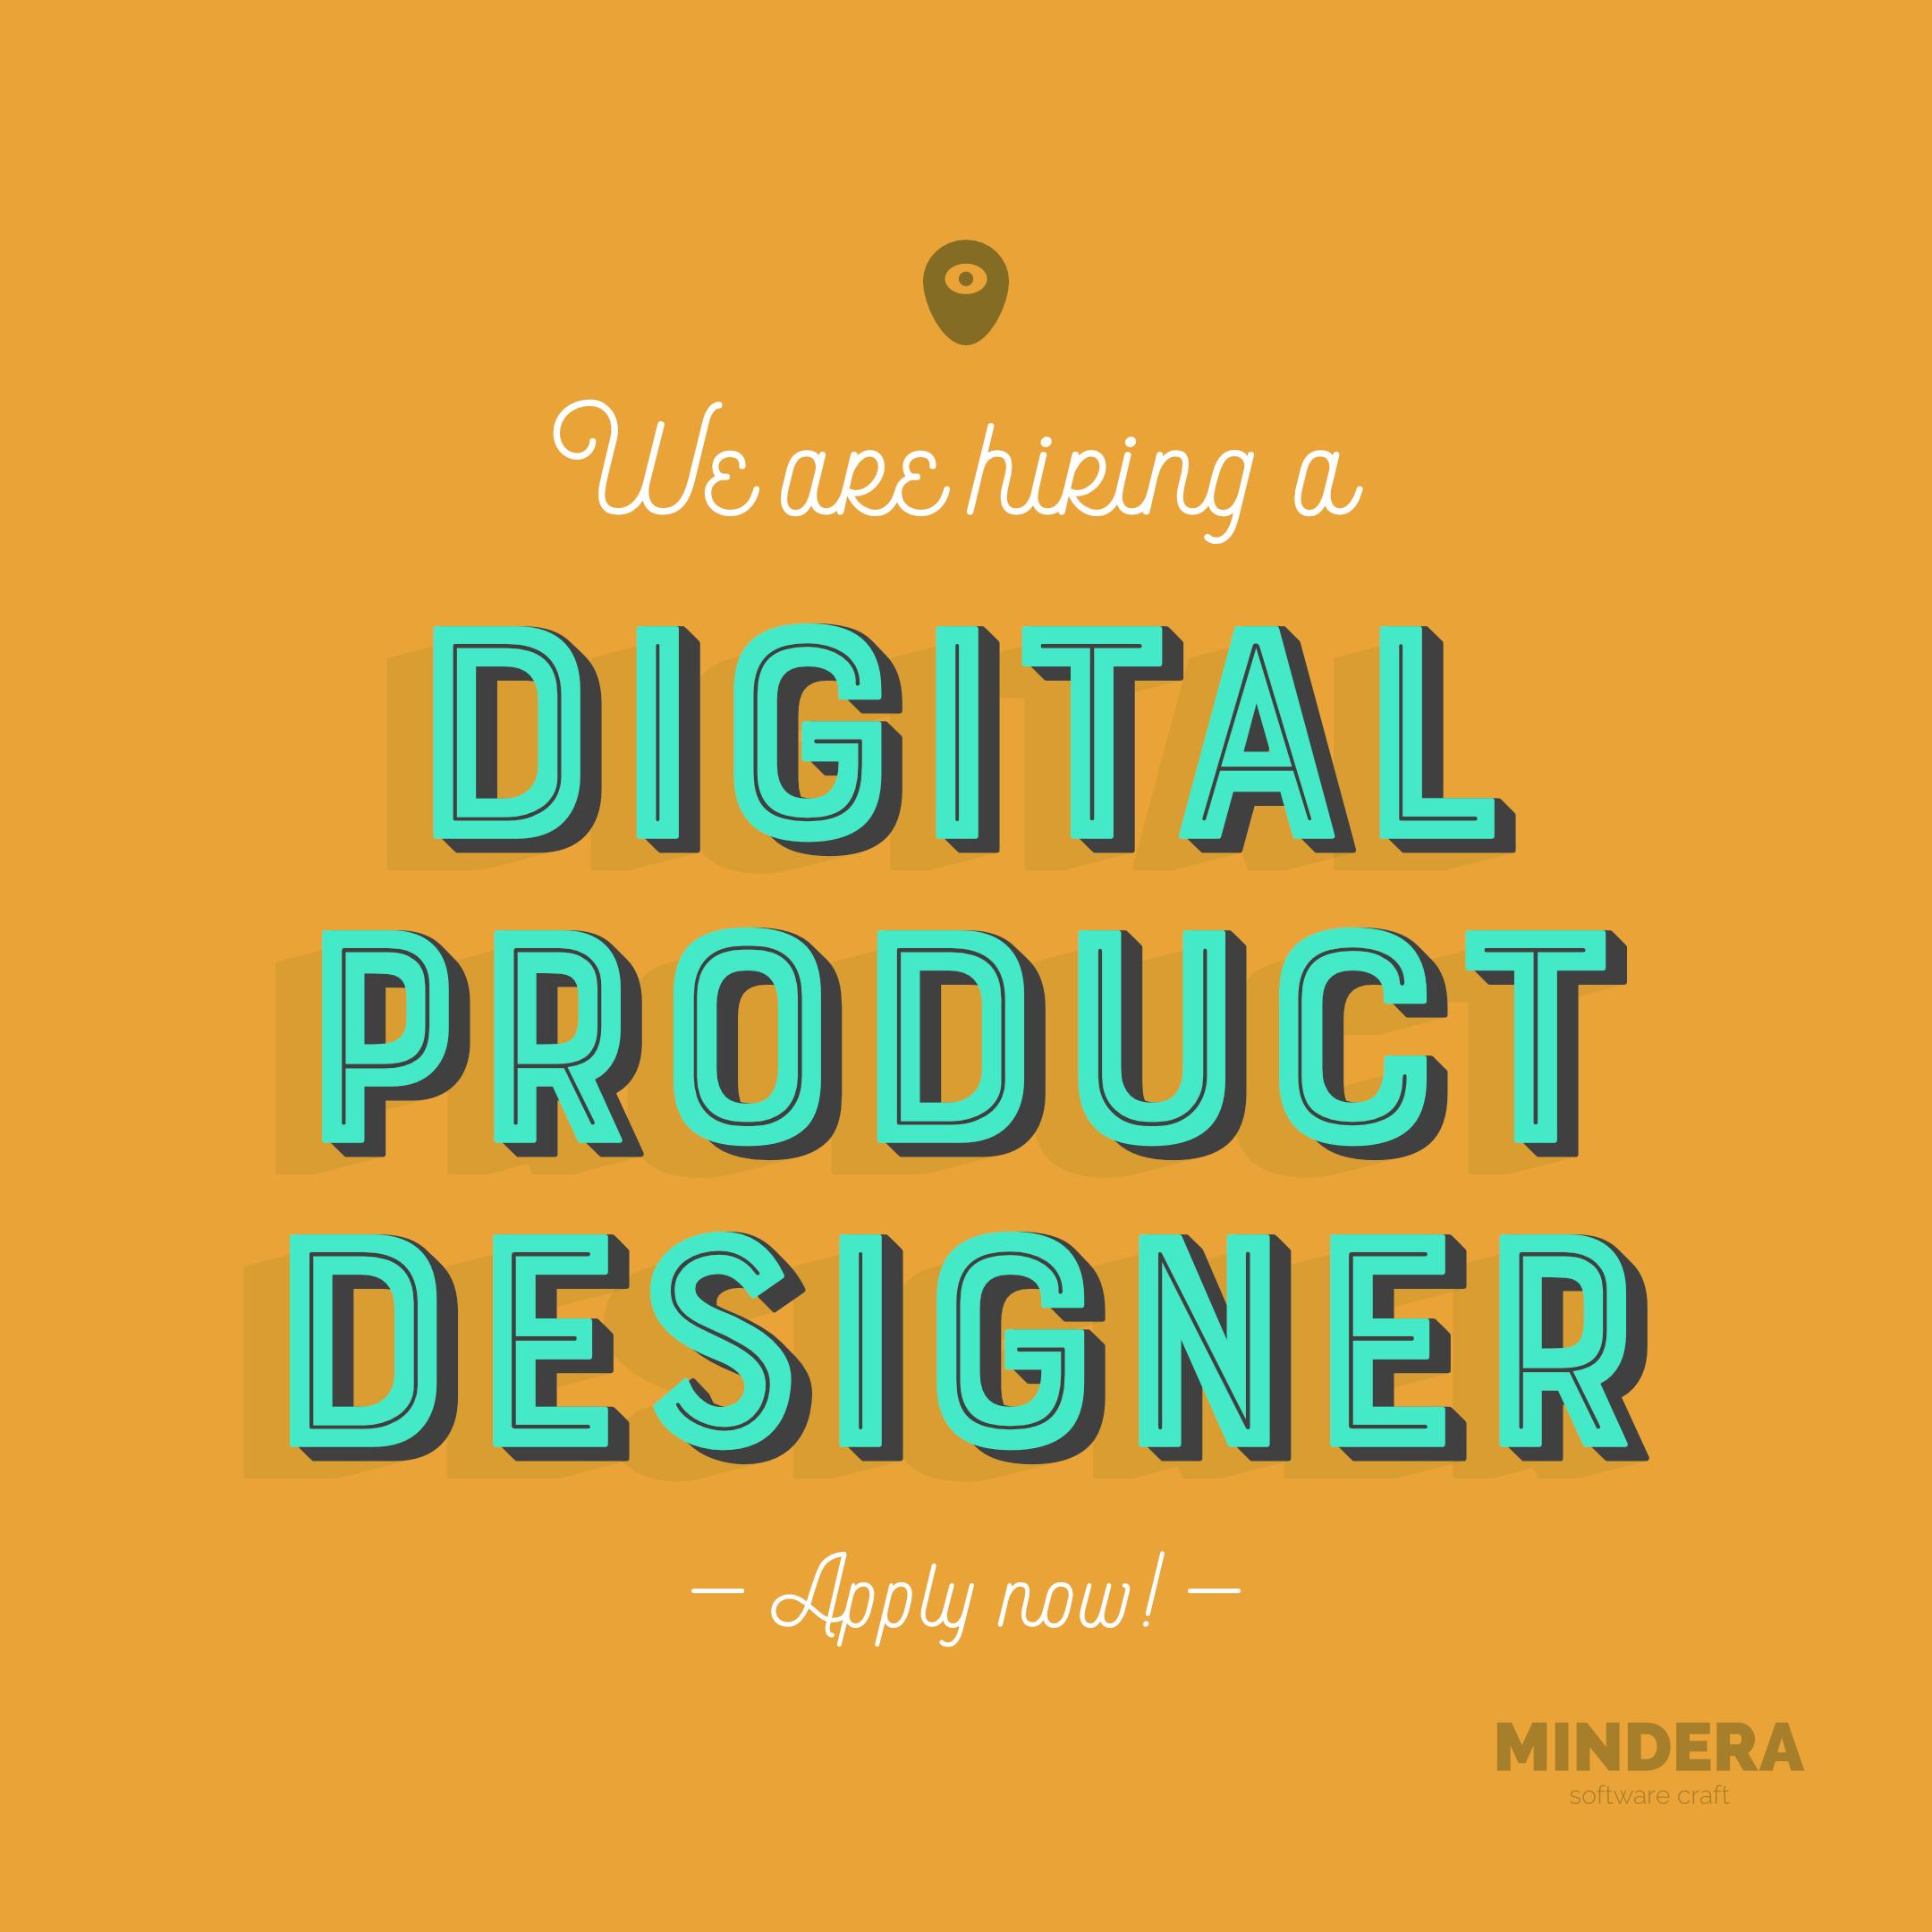 Digital Product Designer M F Mindera,Open Concept Industrial Industrial Creative Office Interior Design